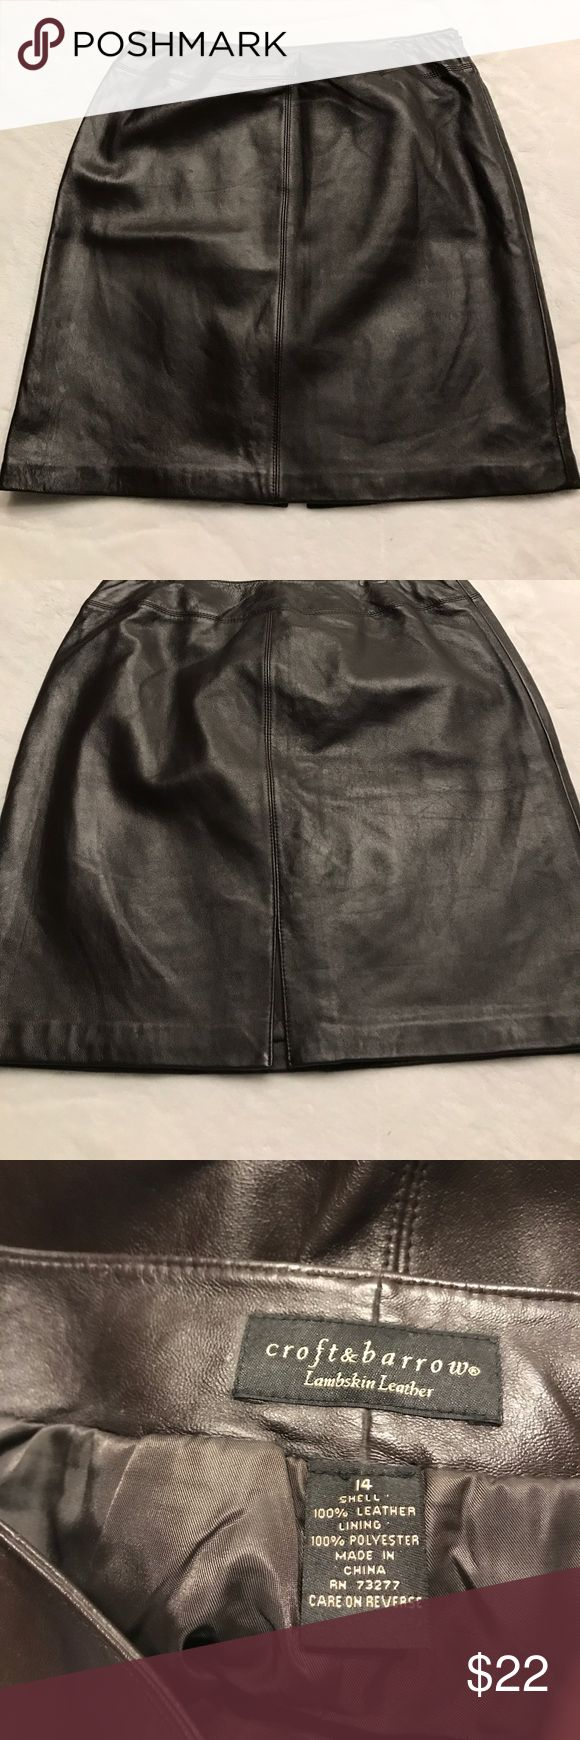 Croft & barrow Lambskin Leather Skirt Cute dark brown lambskin leather skirt length is 20 1/2.  Has zip up side. croft & barrow Skirts